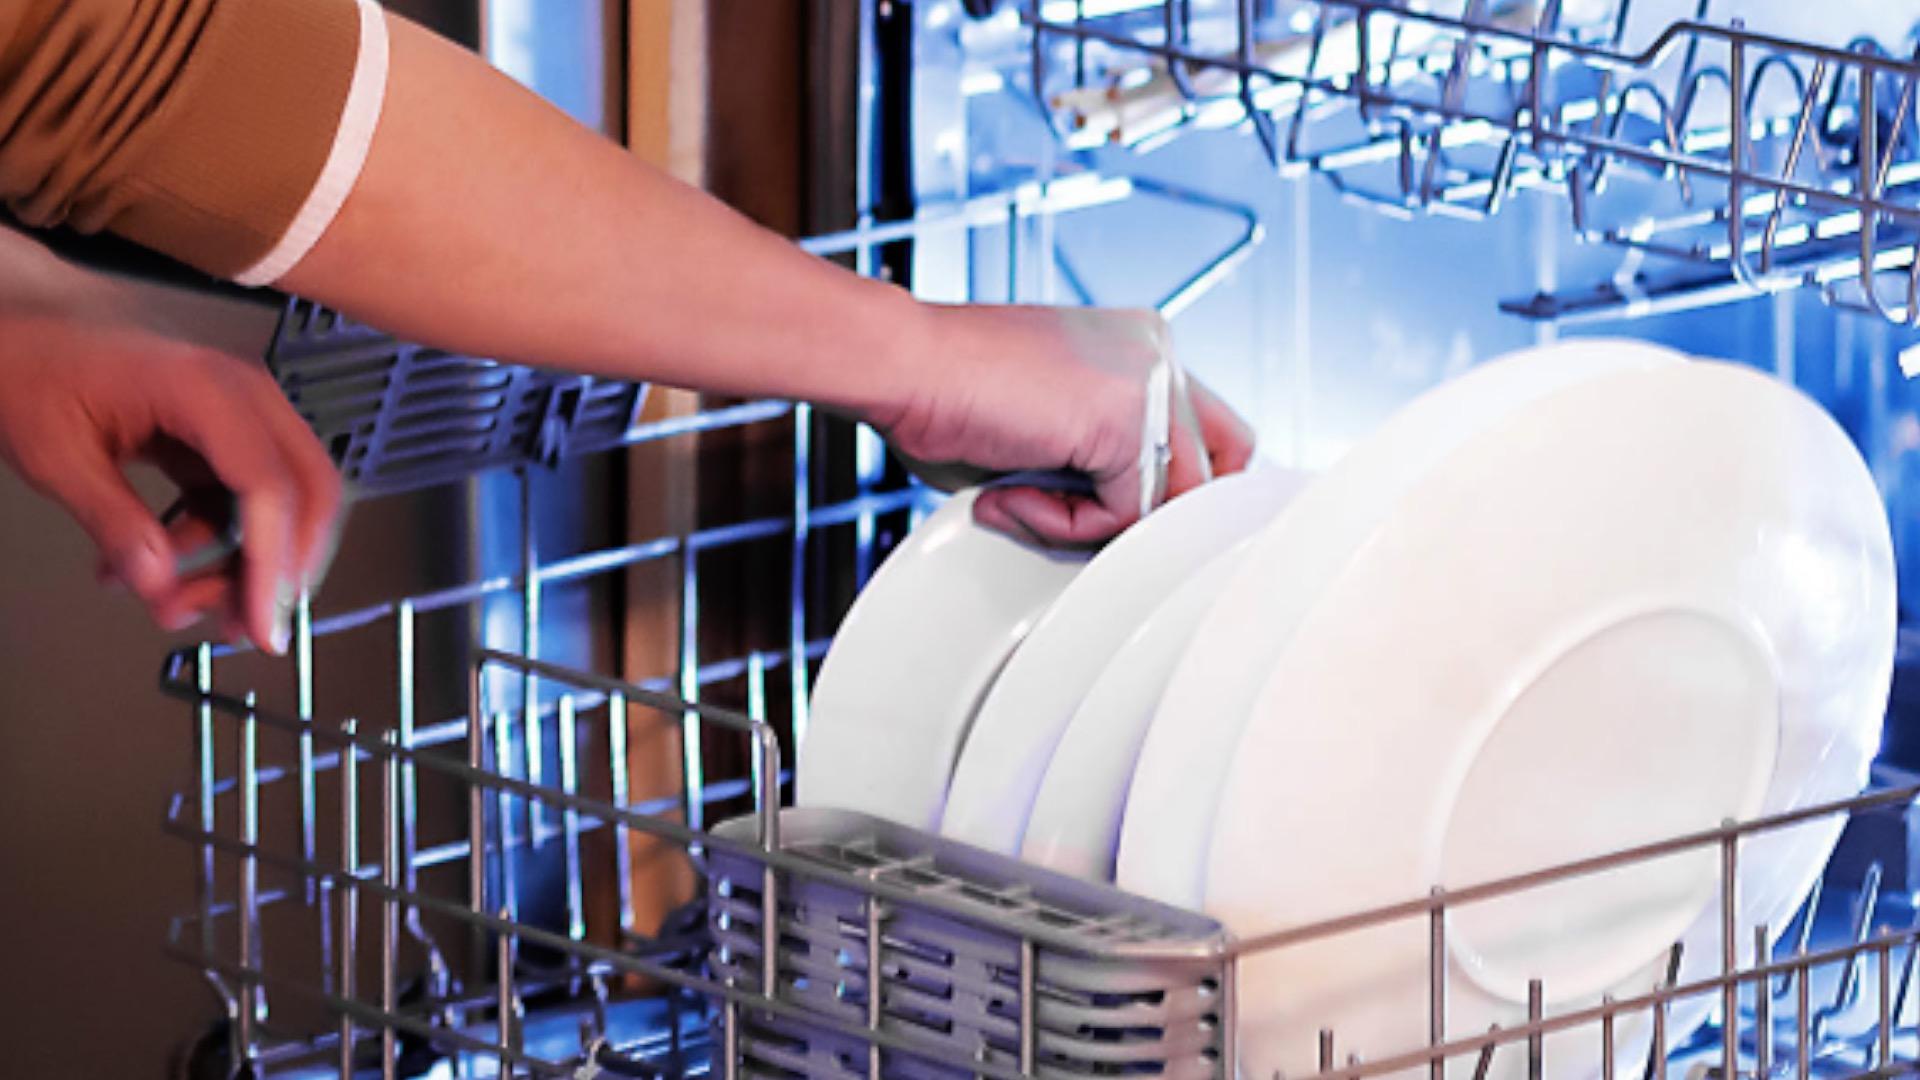 Xiaomi Viomi Smart Dishwasher